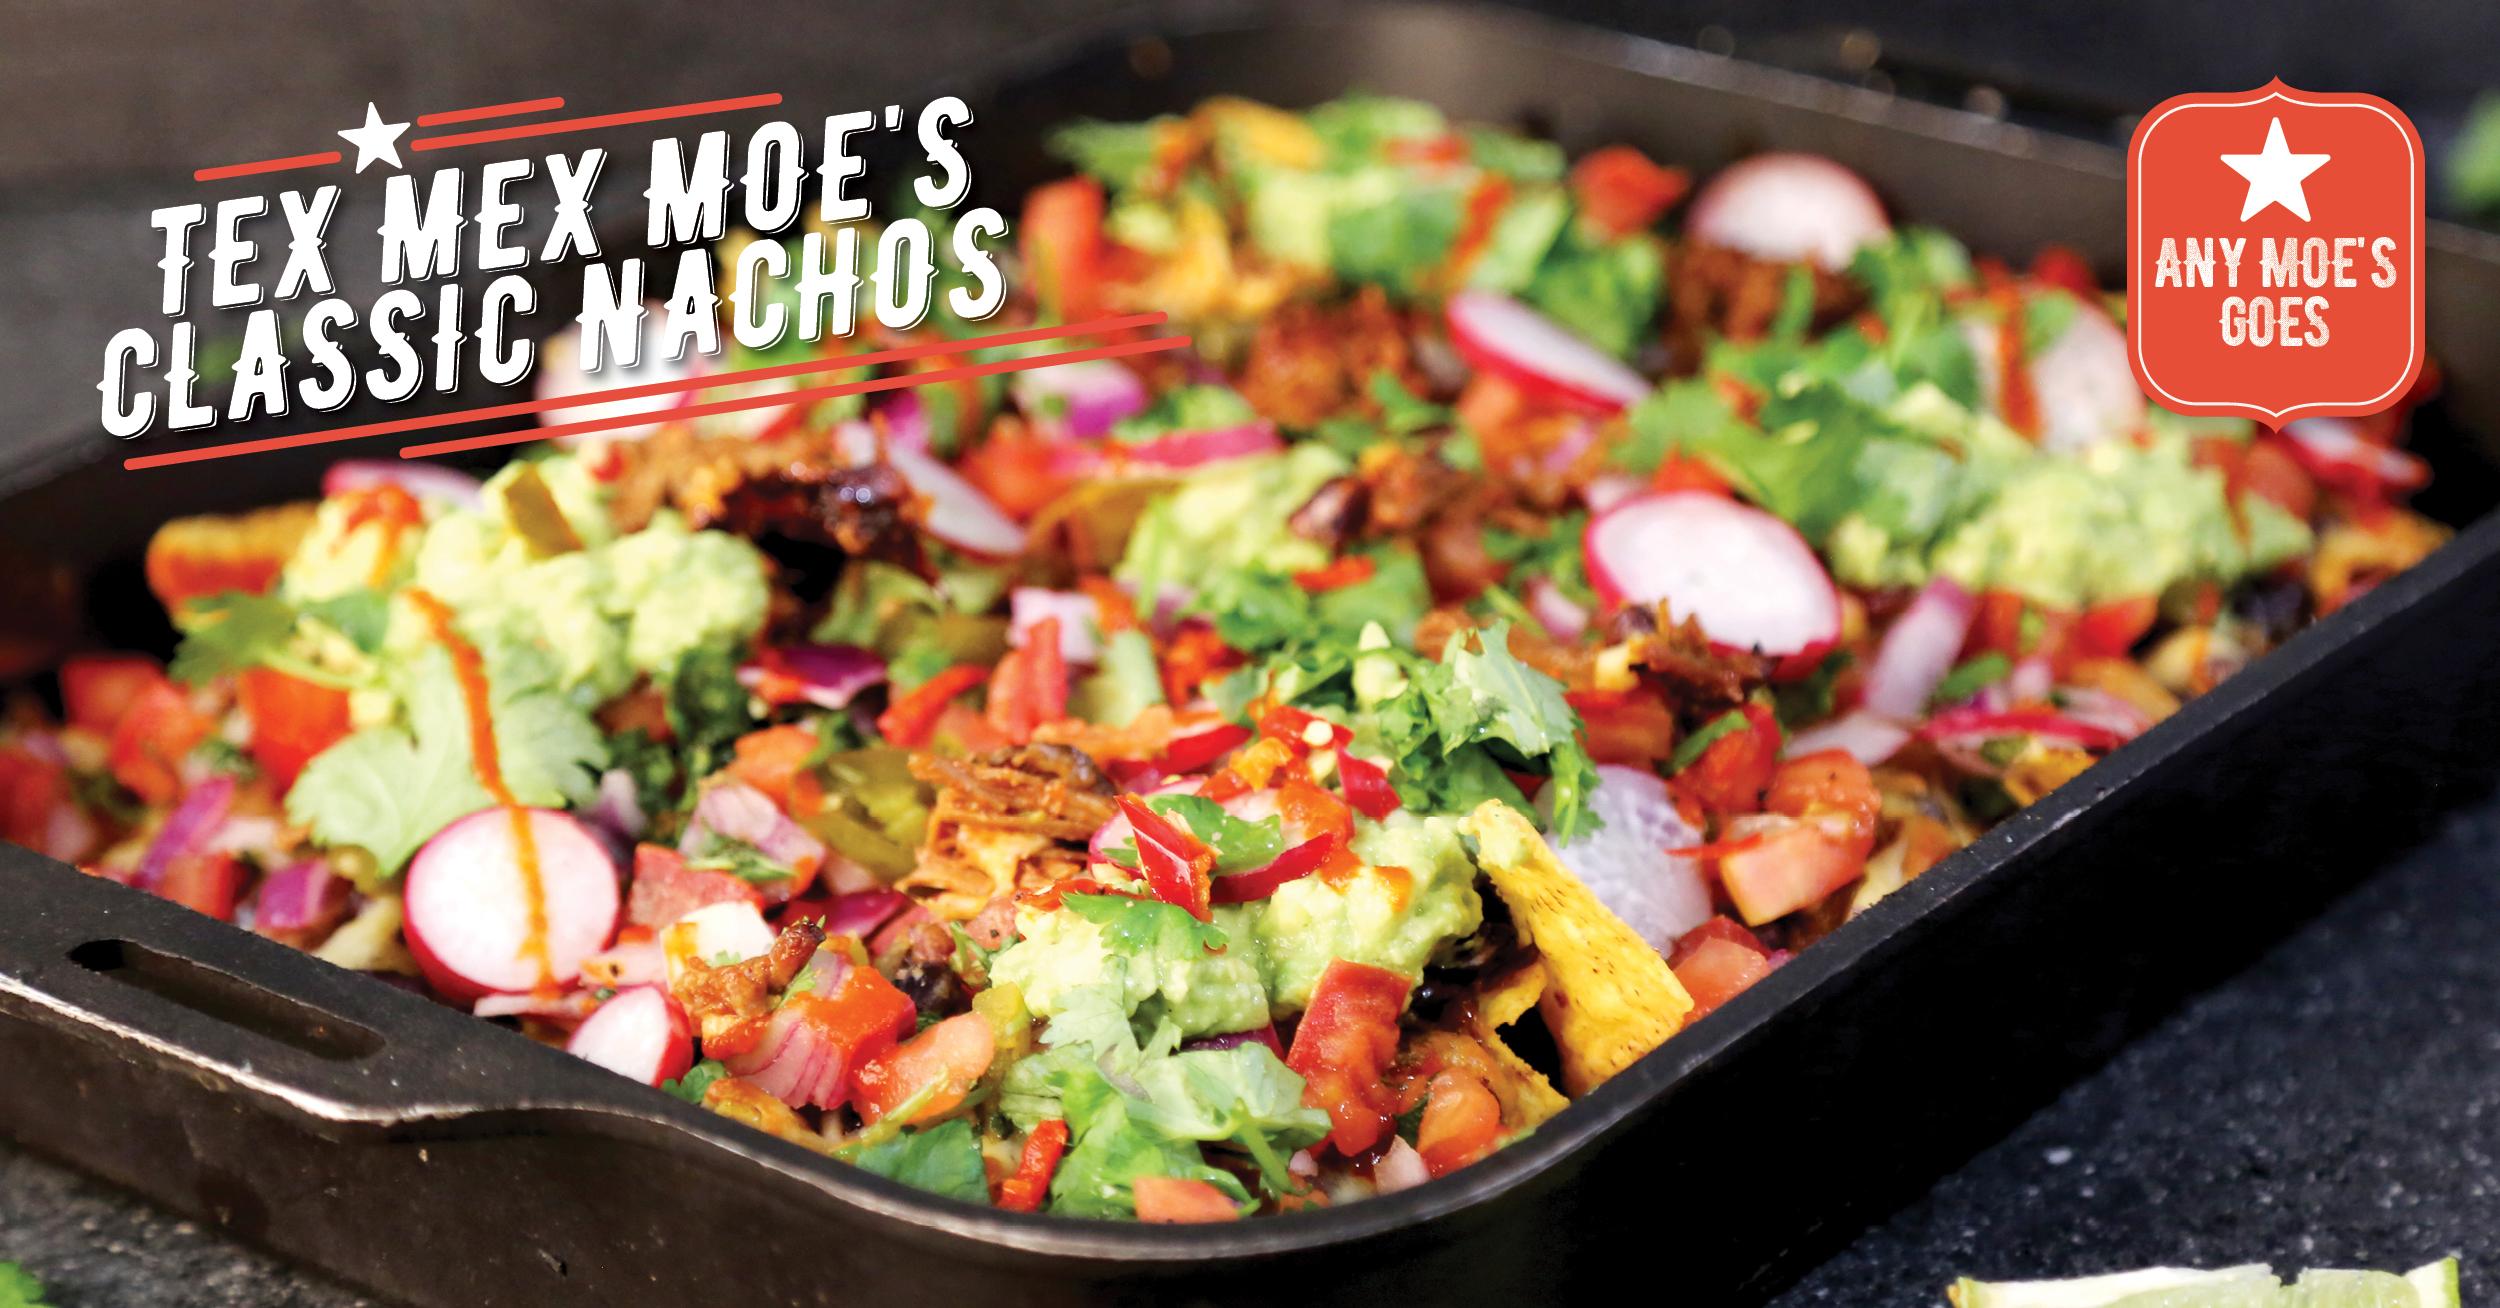 Tex Mex Moe's Classic Nachos